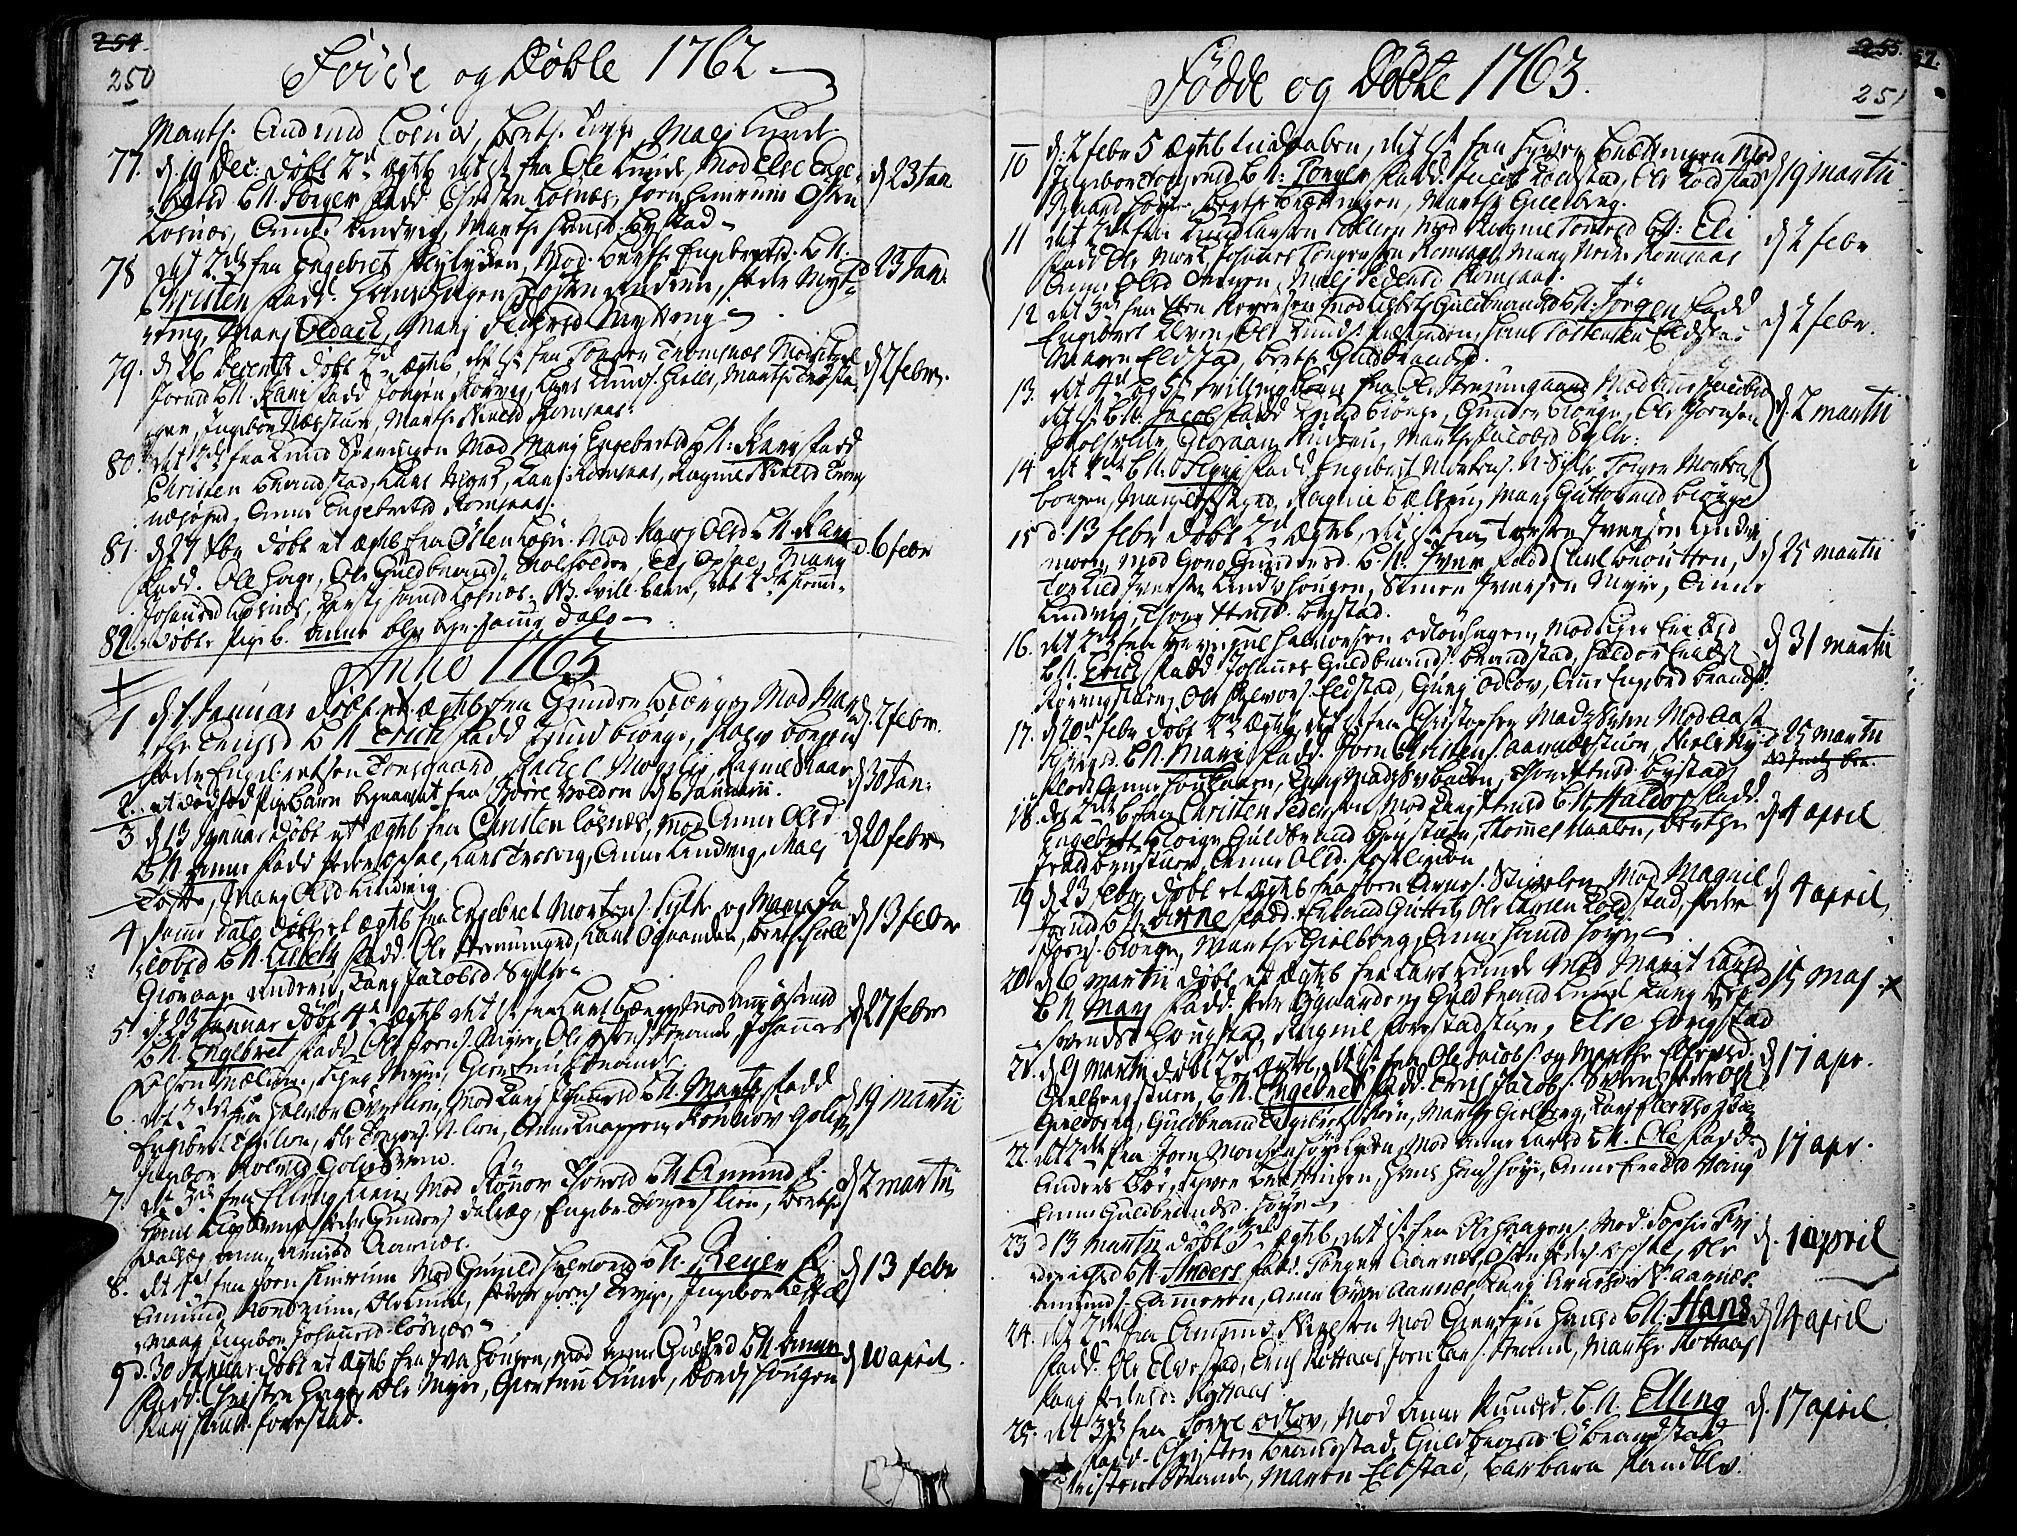 SAH, Ringebu prestekontor, Ministerialbok nr. 2, 1734-1780, s. 250-251